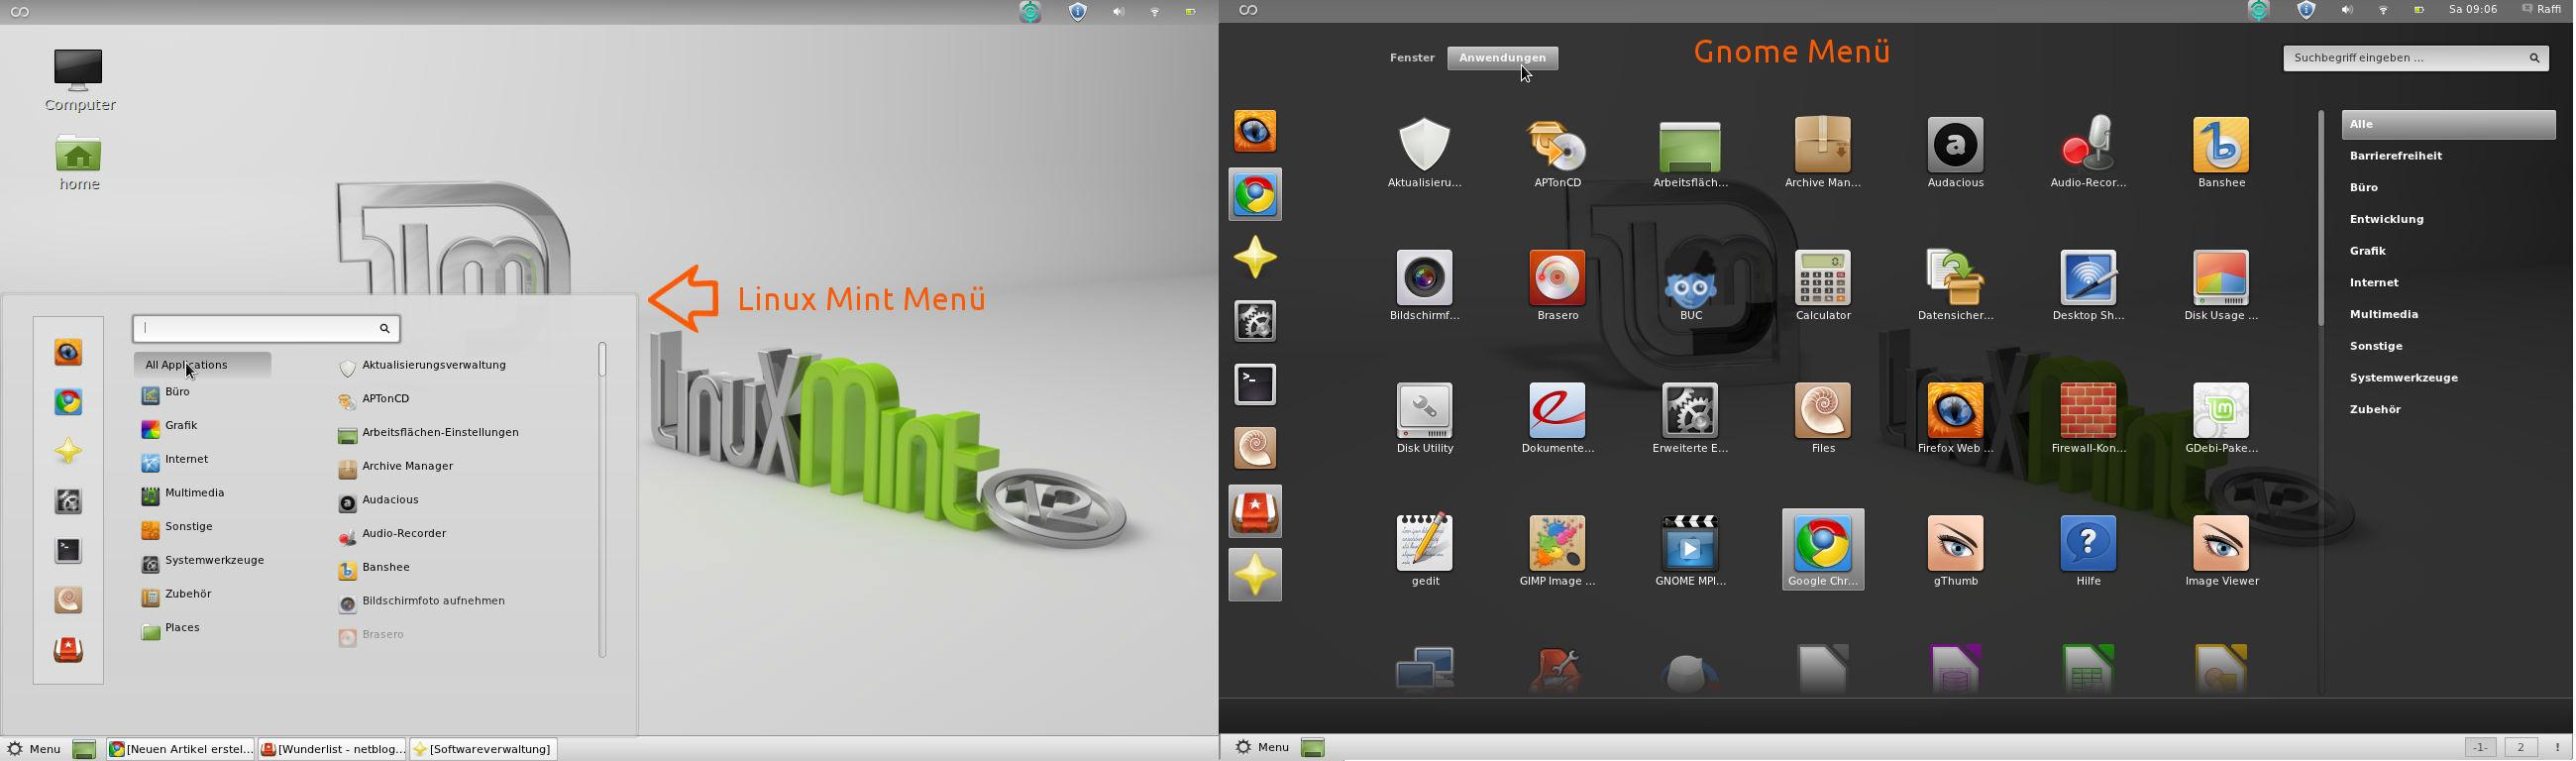 How To Edit Linux Mint Start Menu